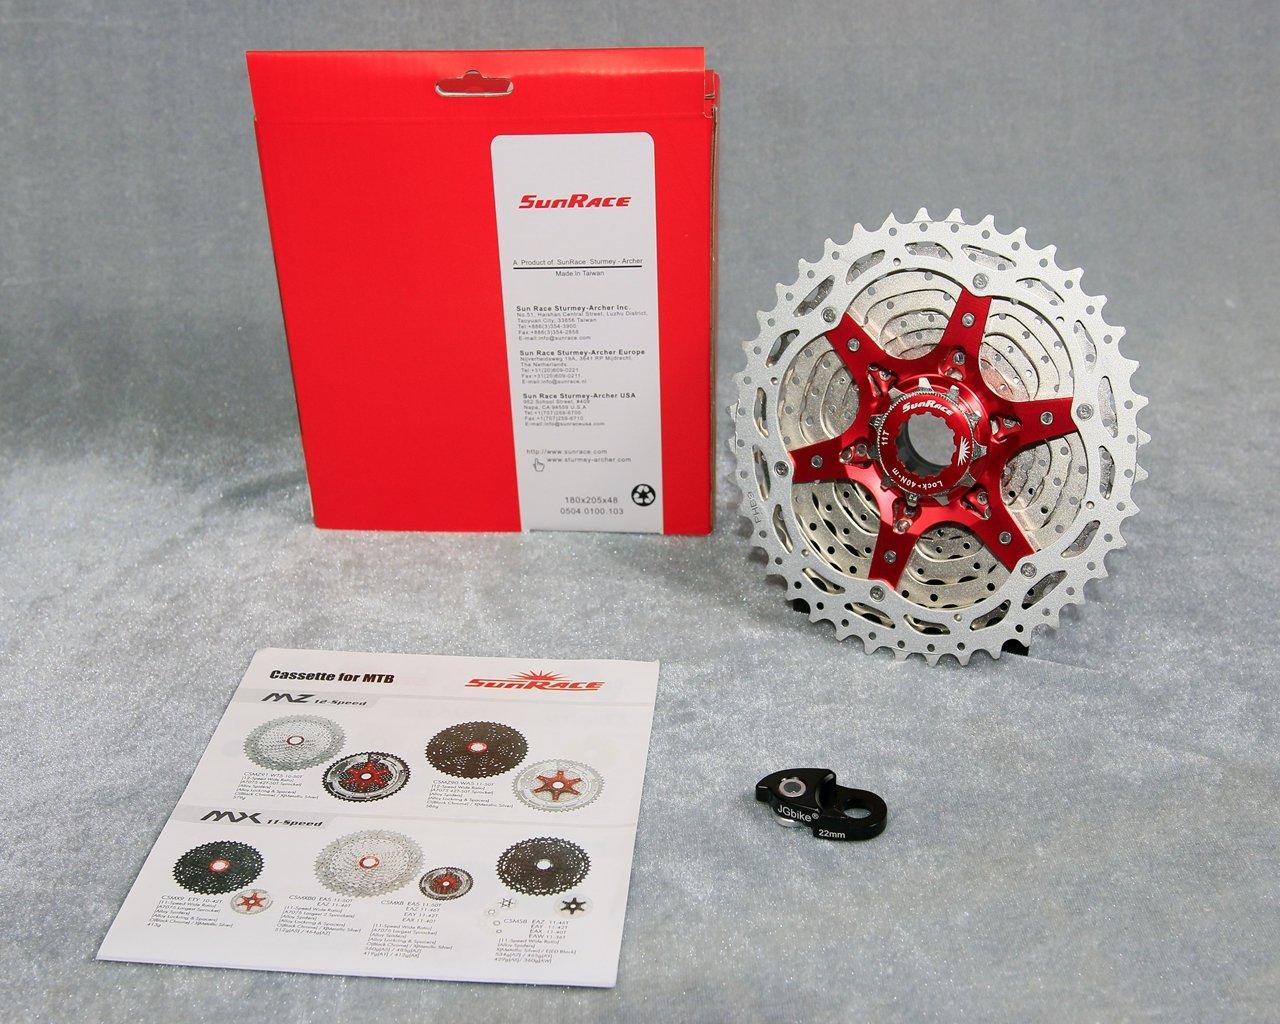 JGbike Sunrace 10 Speed Cassette 11-40T CSMX3 Silver Wide Ratio MTB Cassette for Mountain Bike Including Extender